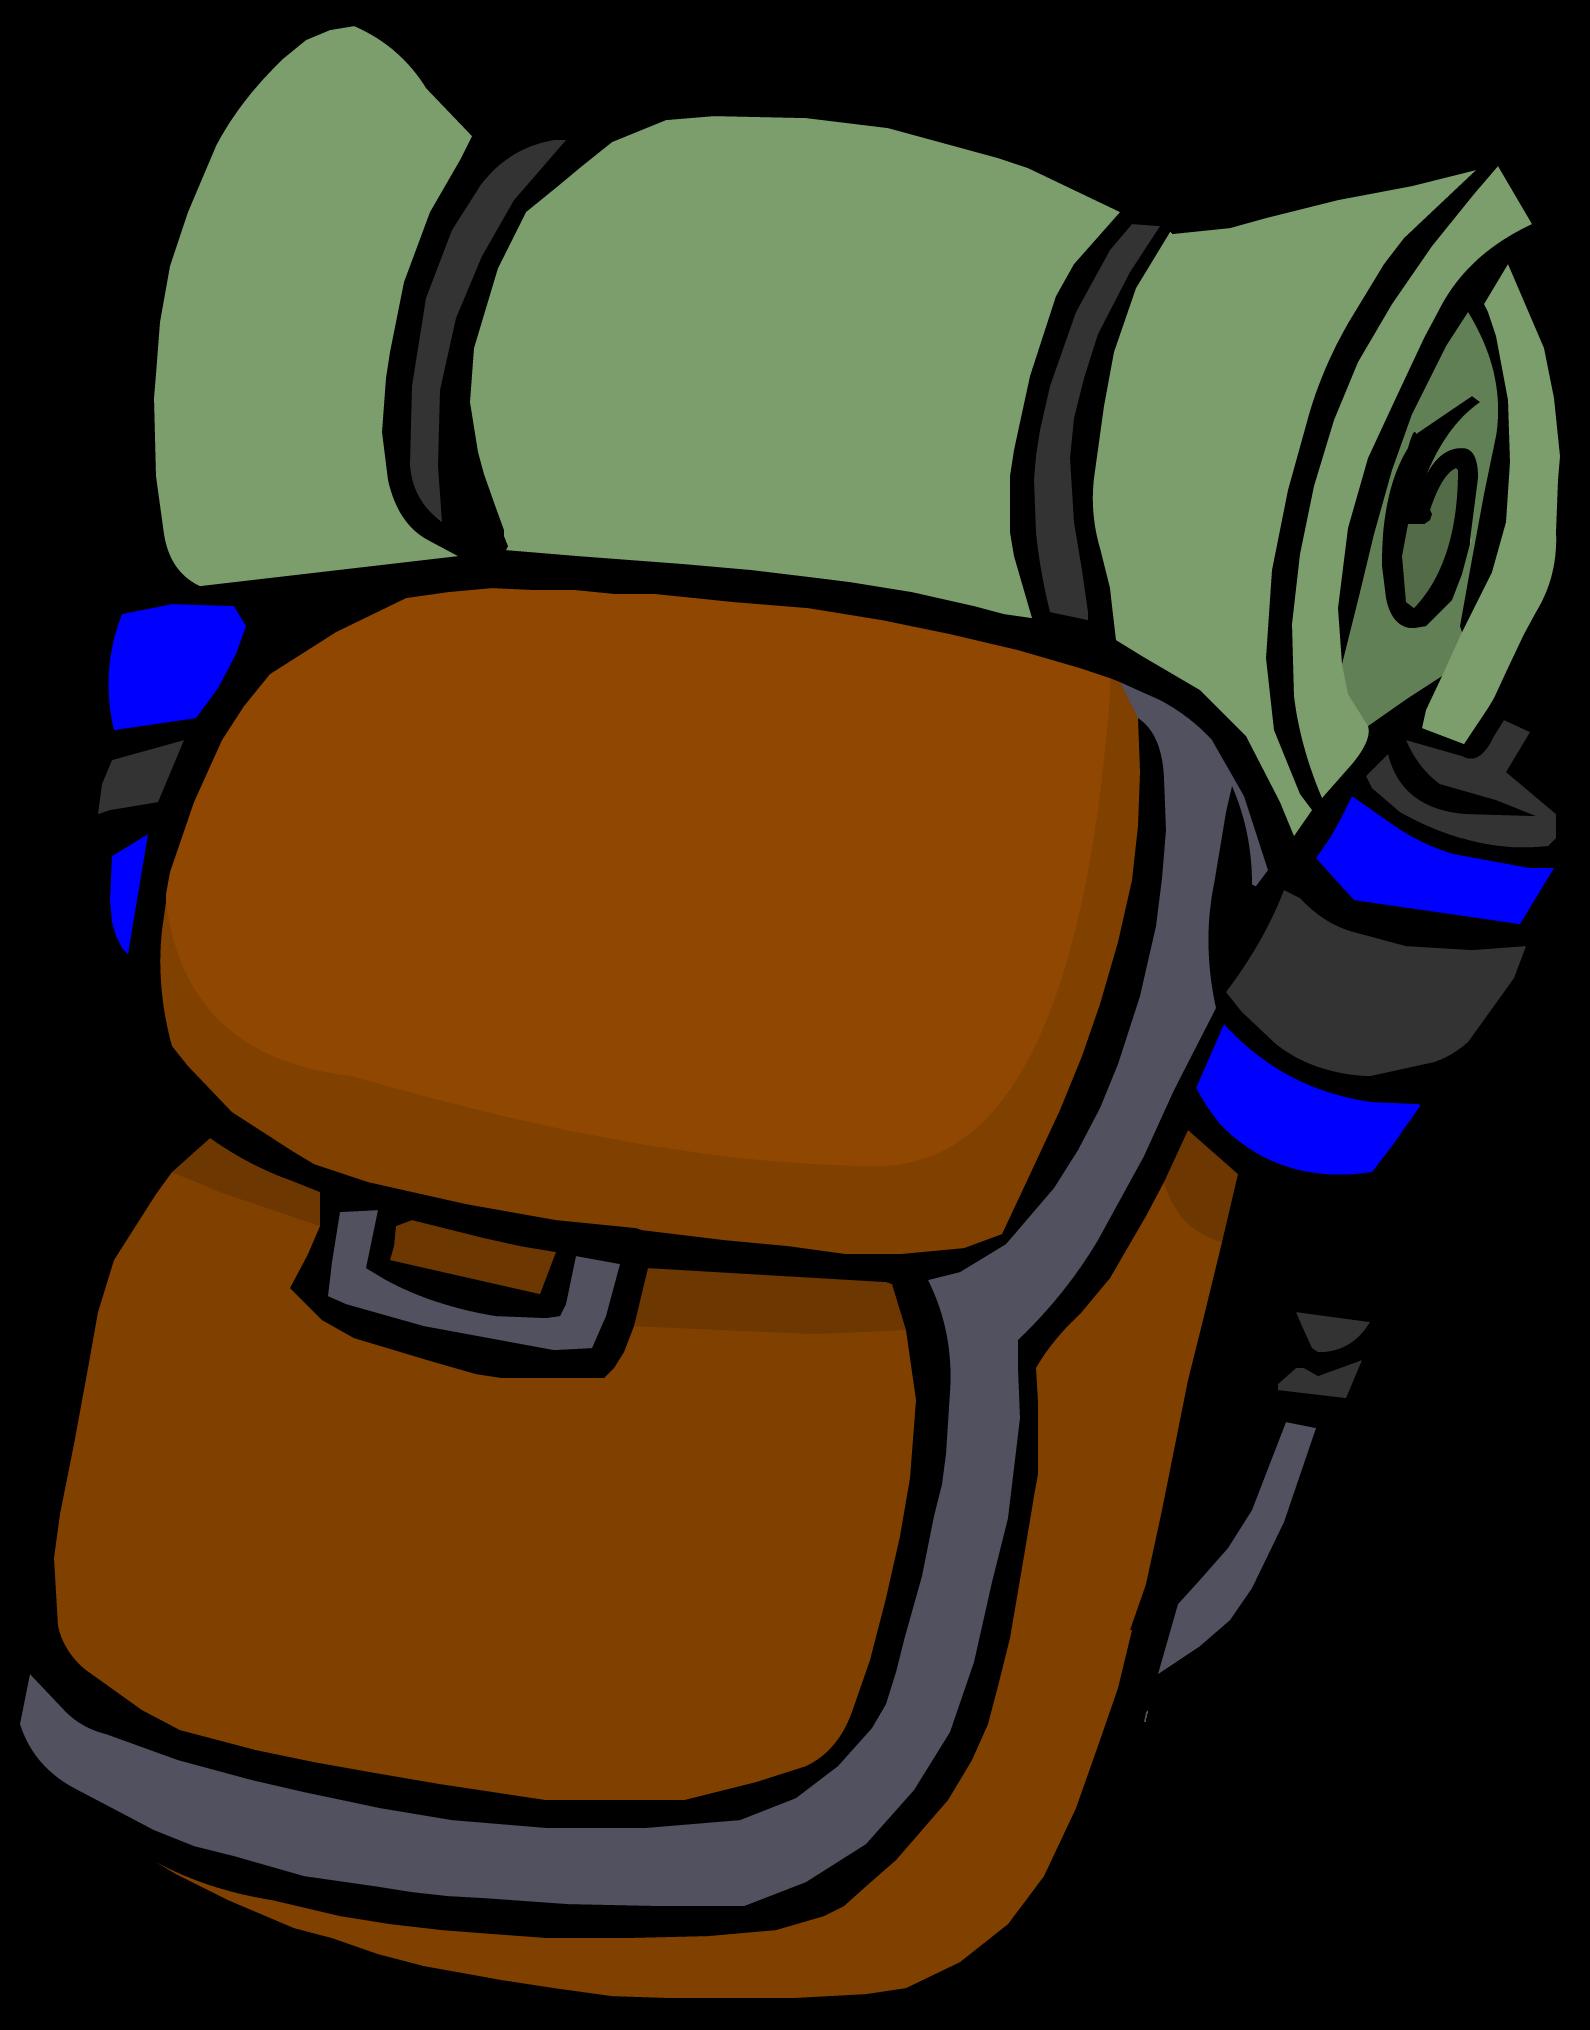 1590x2030 Hiking Backpack Club Penguin Wiki Fandom Powered By Wikia